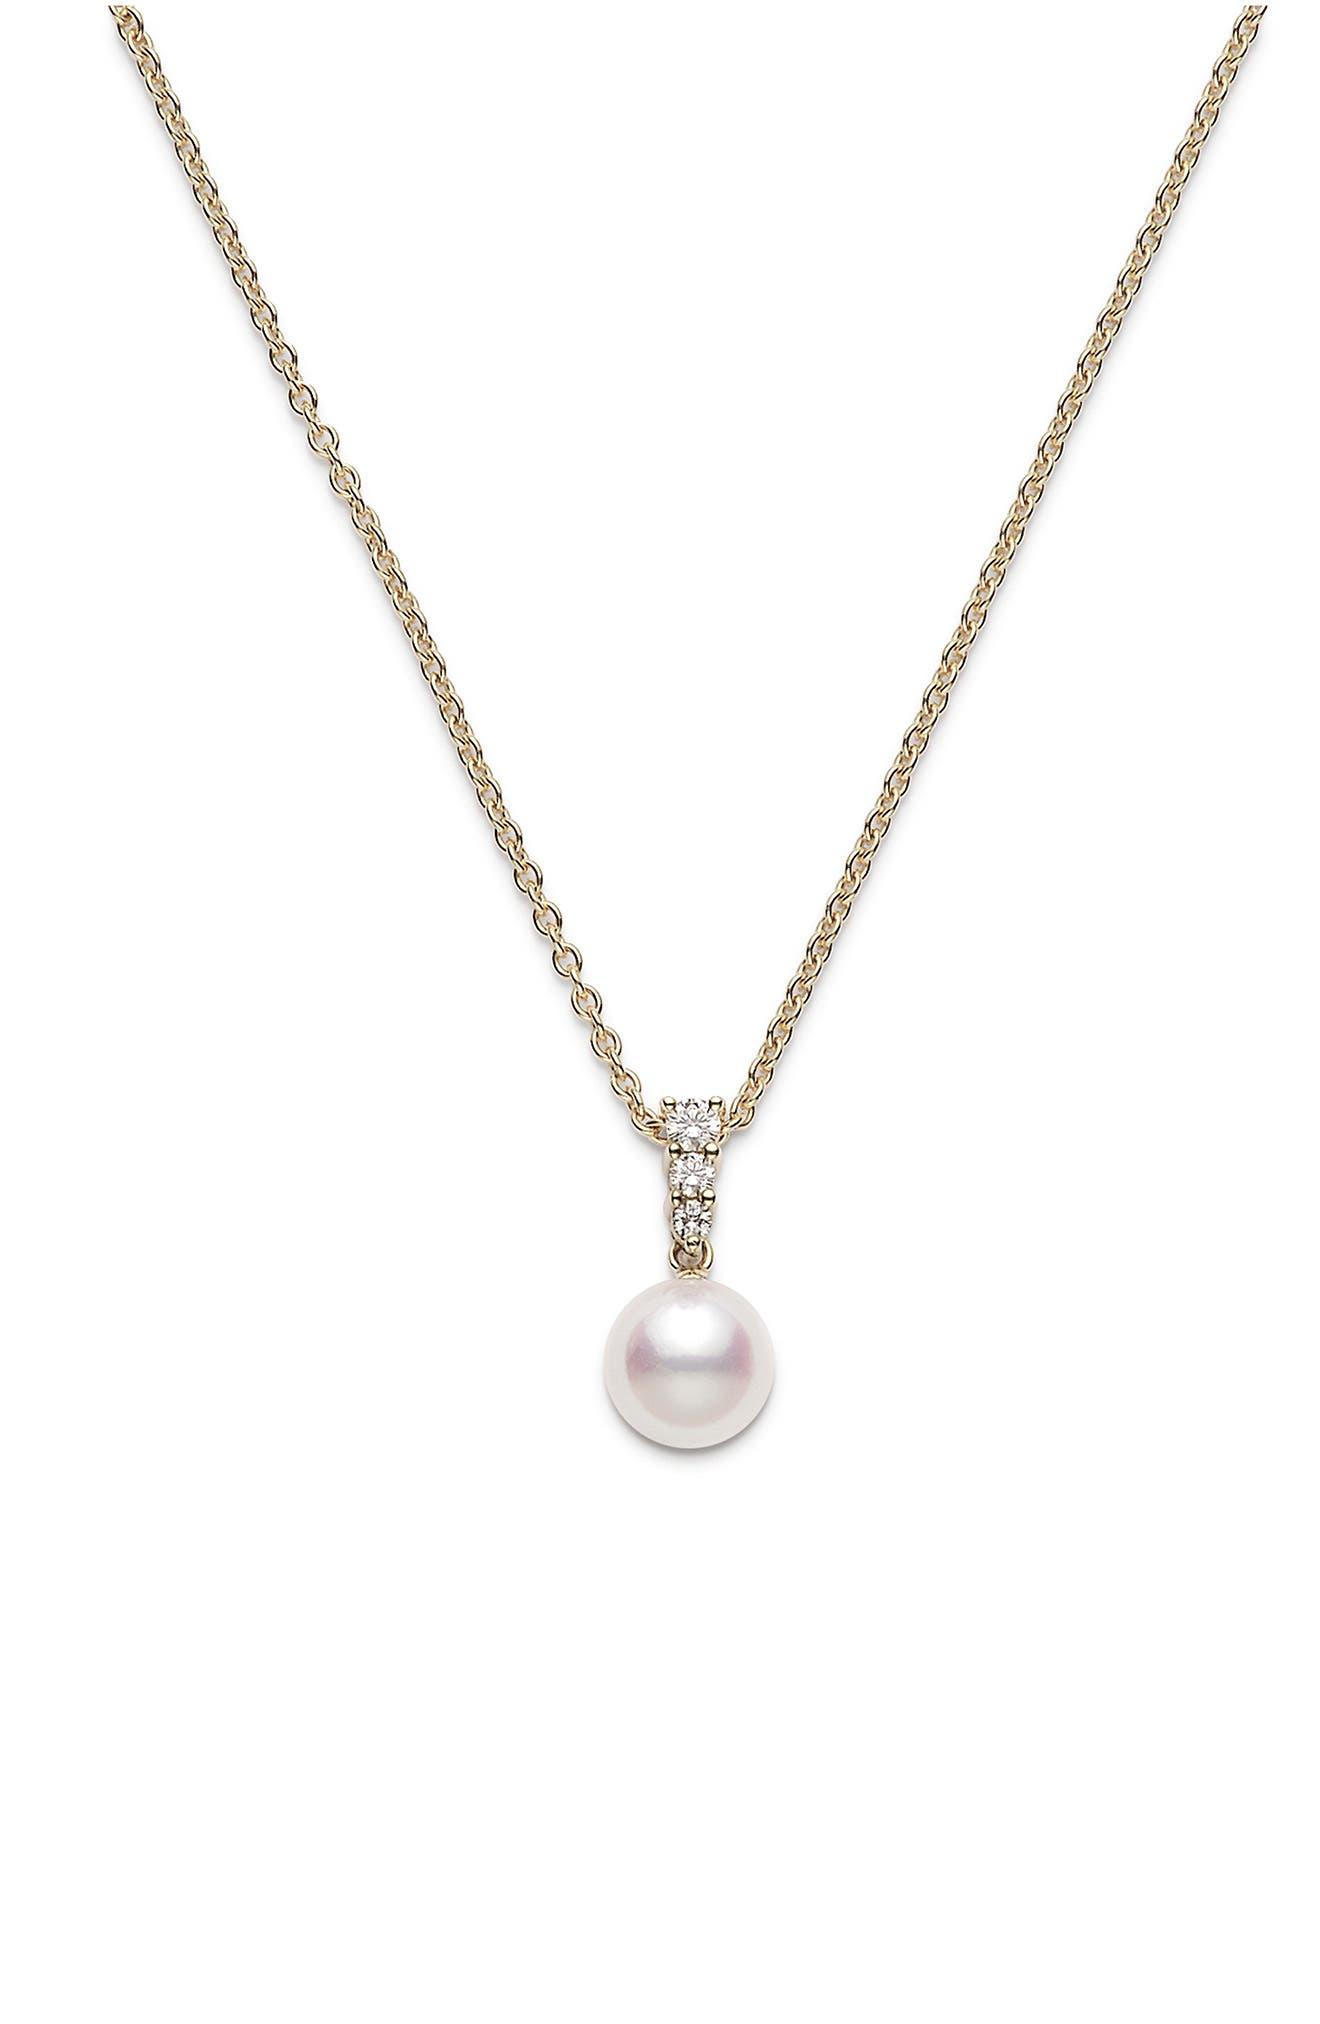 Morning Dew Pearl & Diamond Pendant Necklace